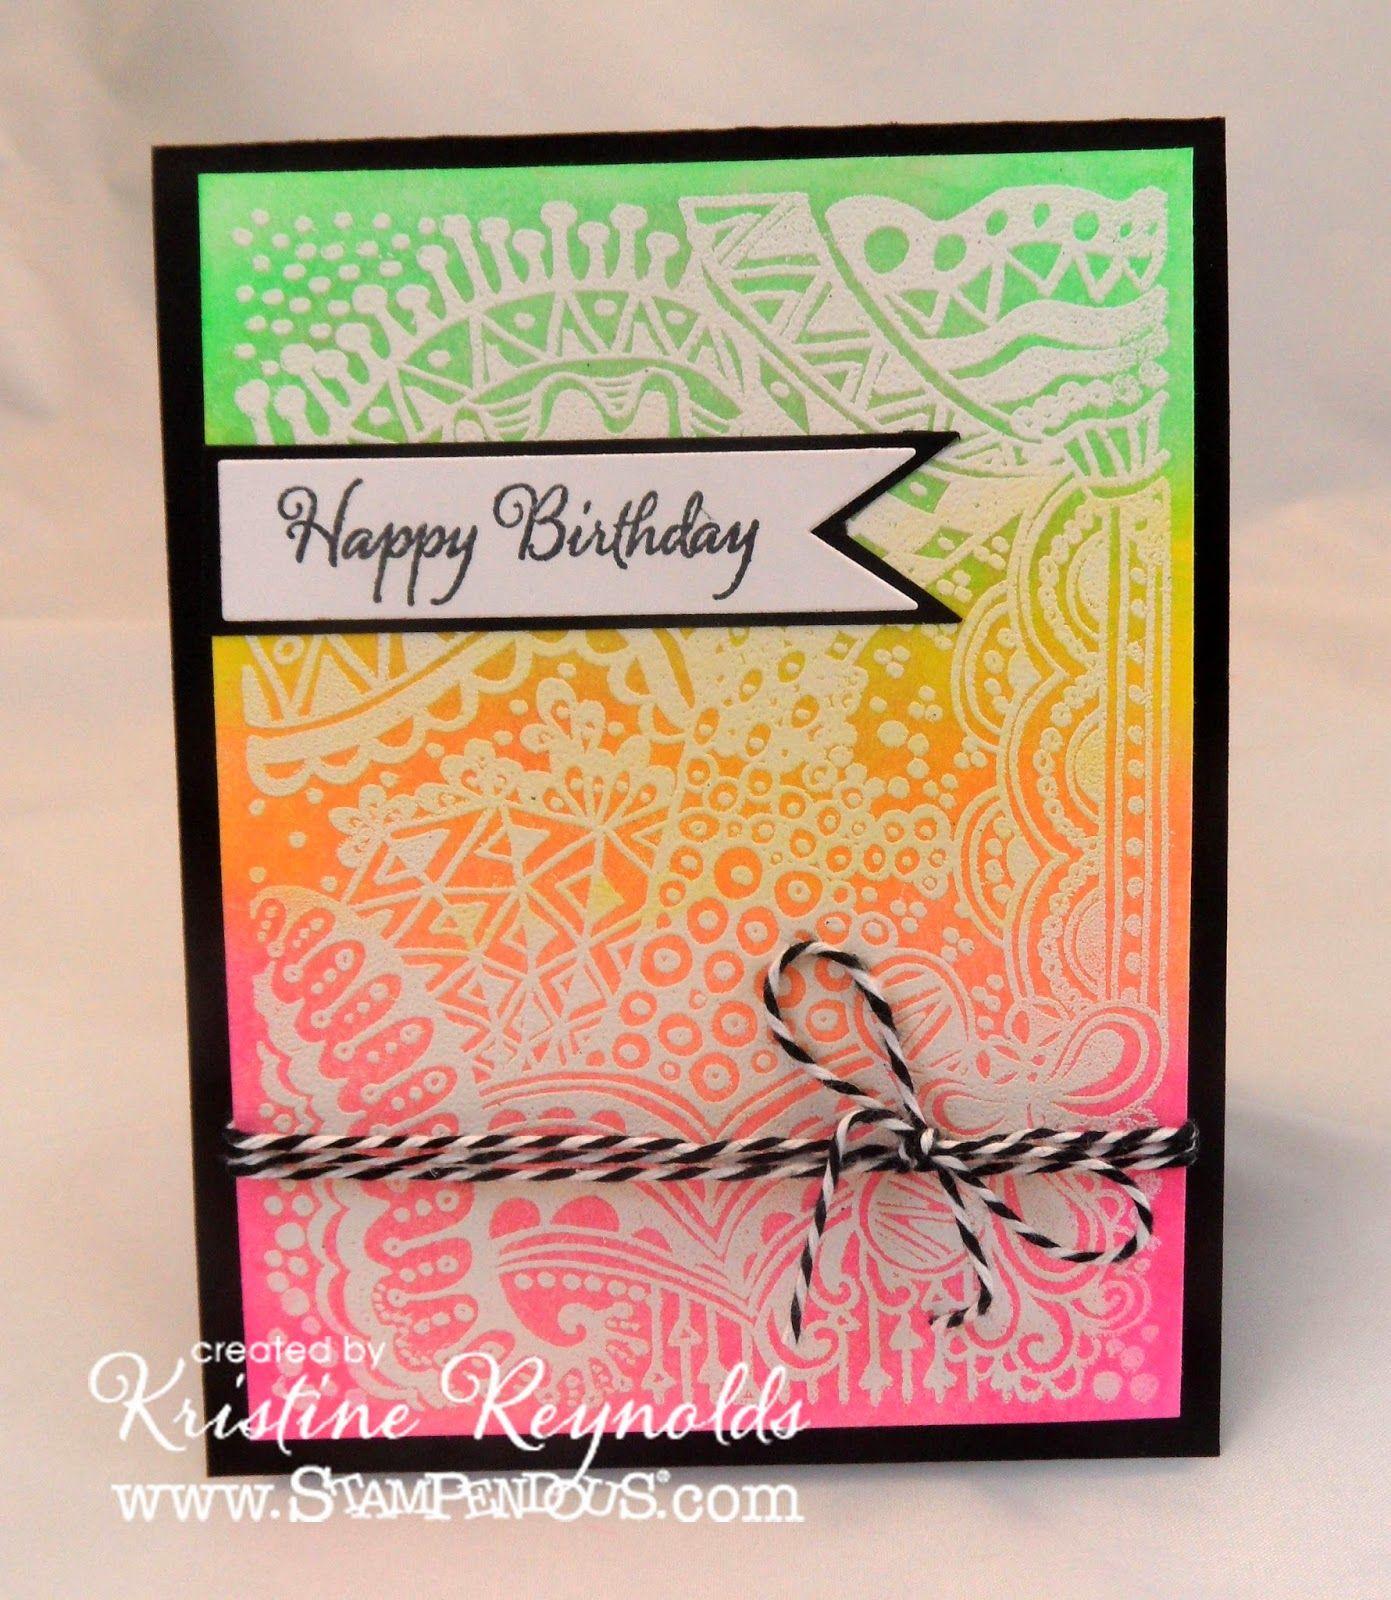 Penpatterns stampendous imagine crafts neon card ideas